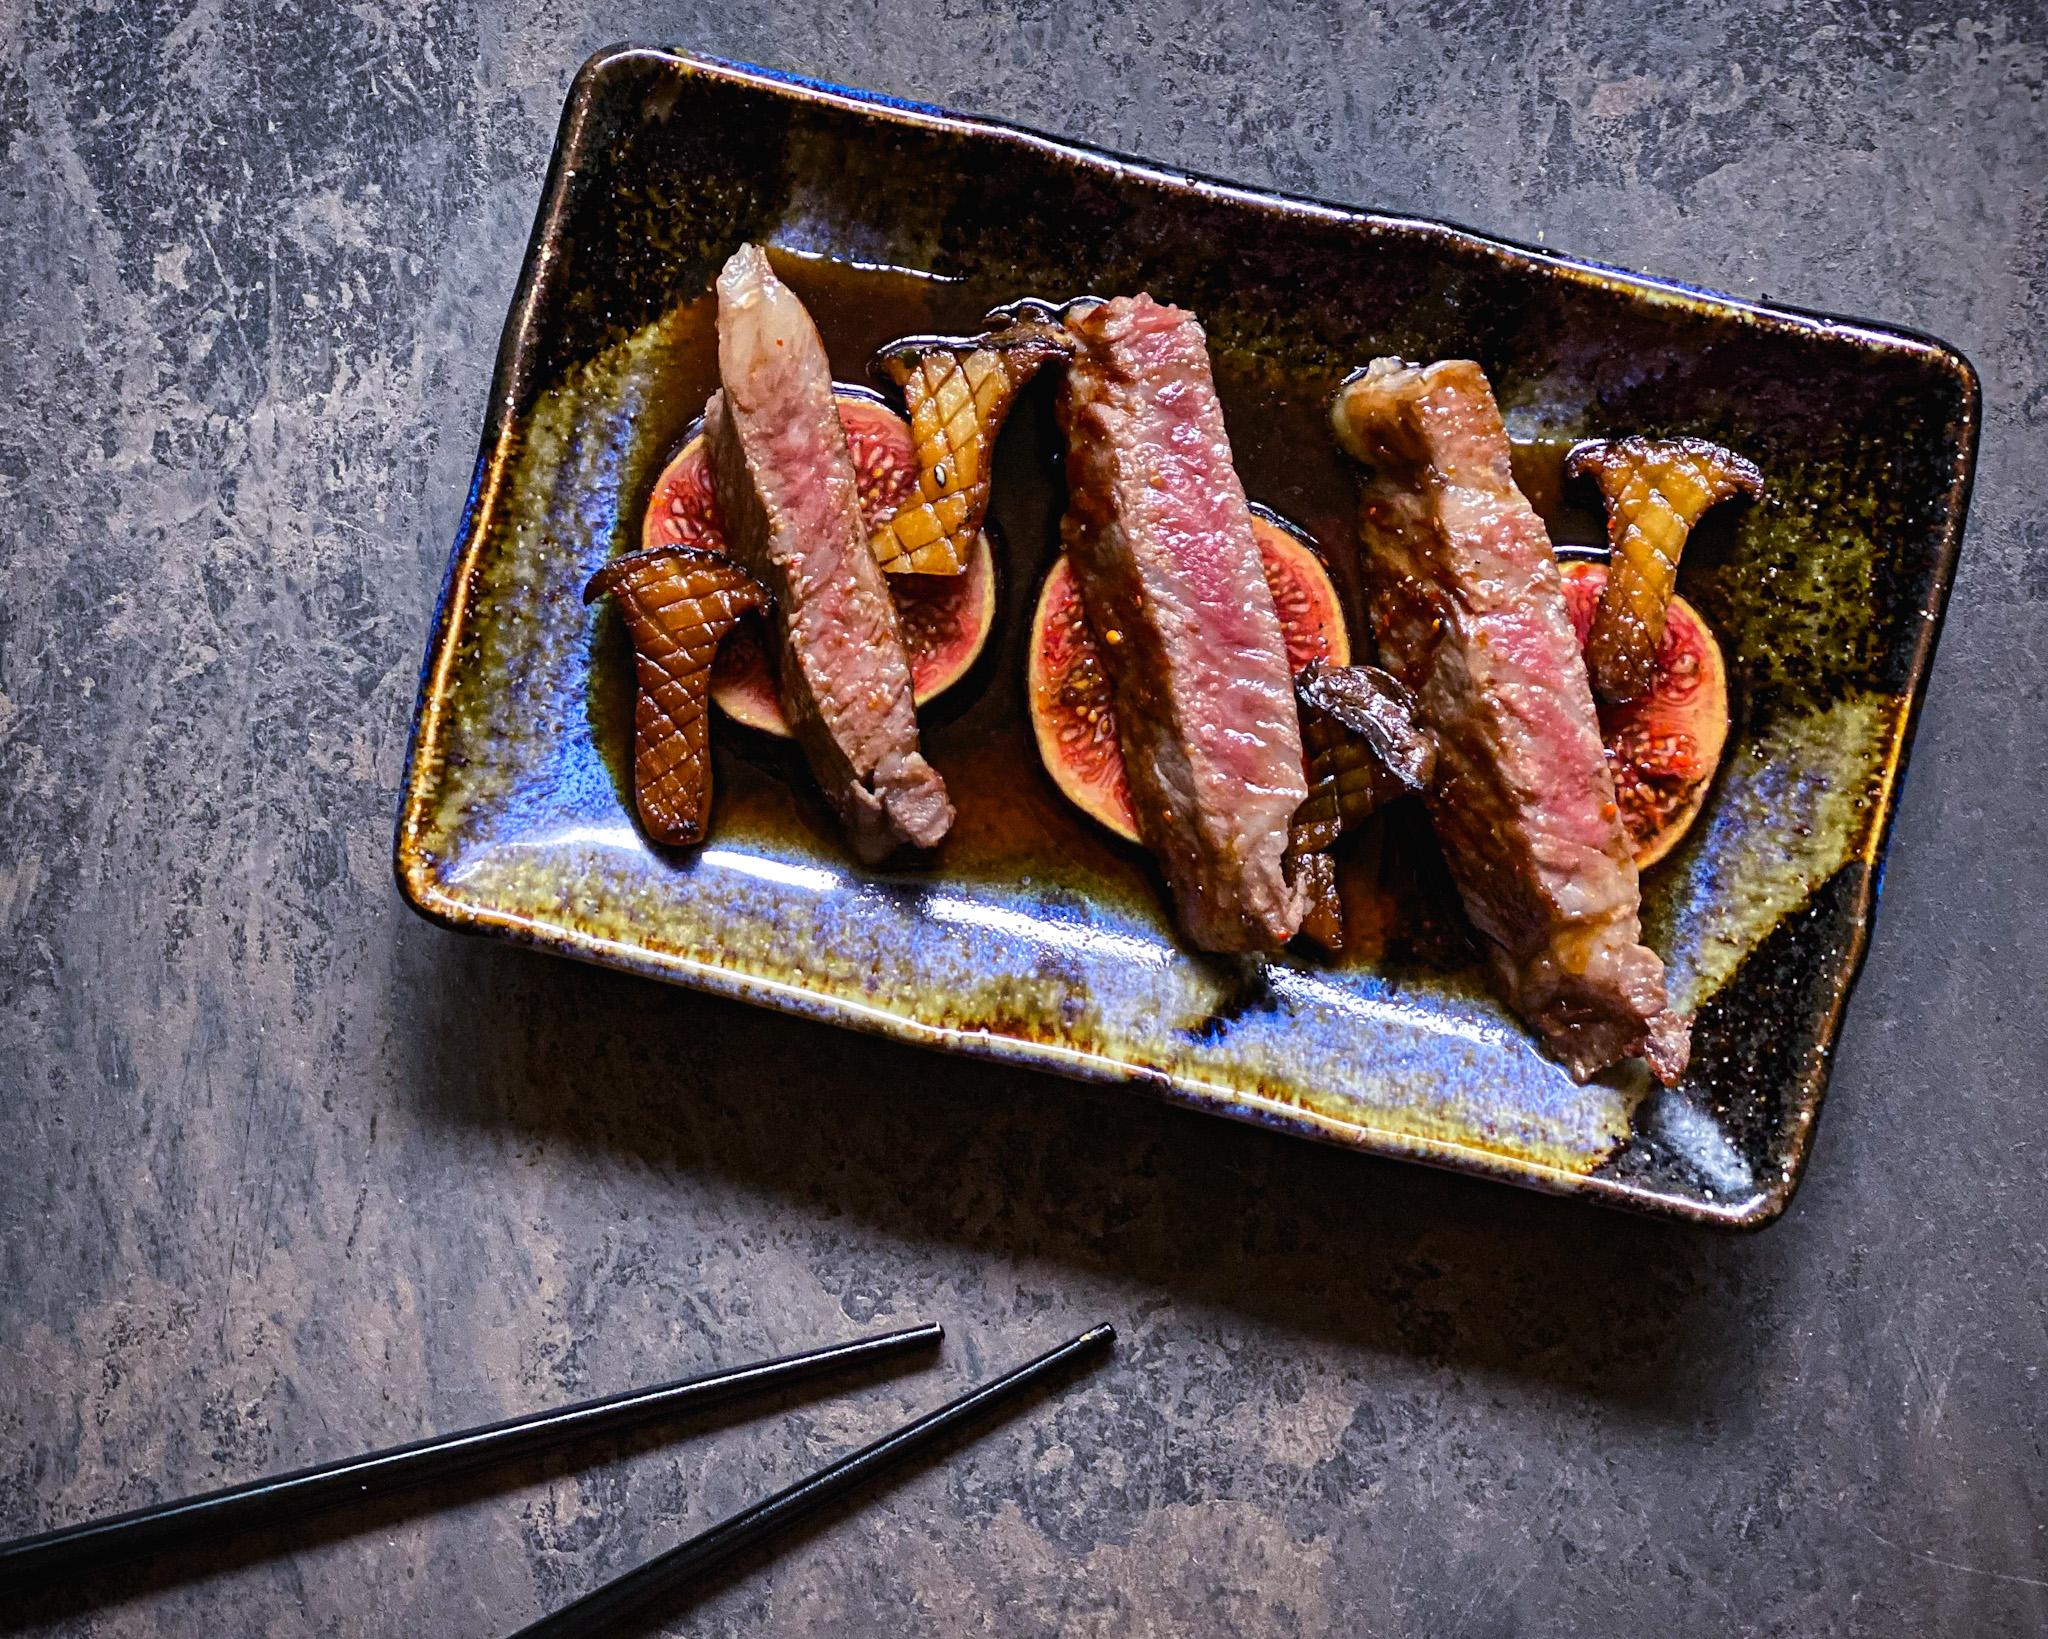 Wagyu casalingo-gourmet: la pregiata carne giapponese cucinata in casa